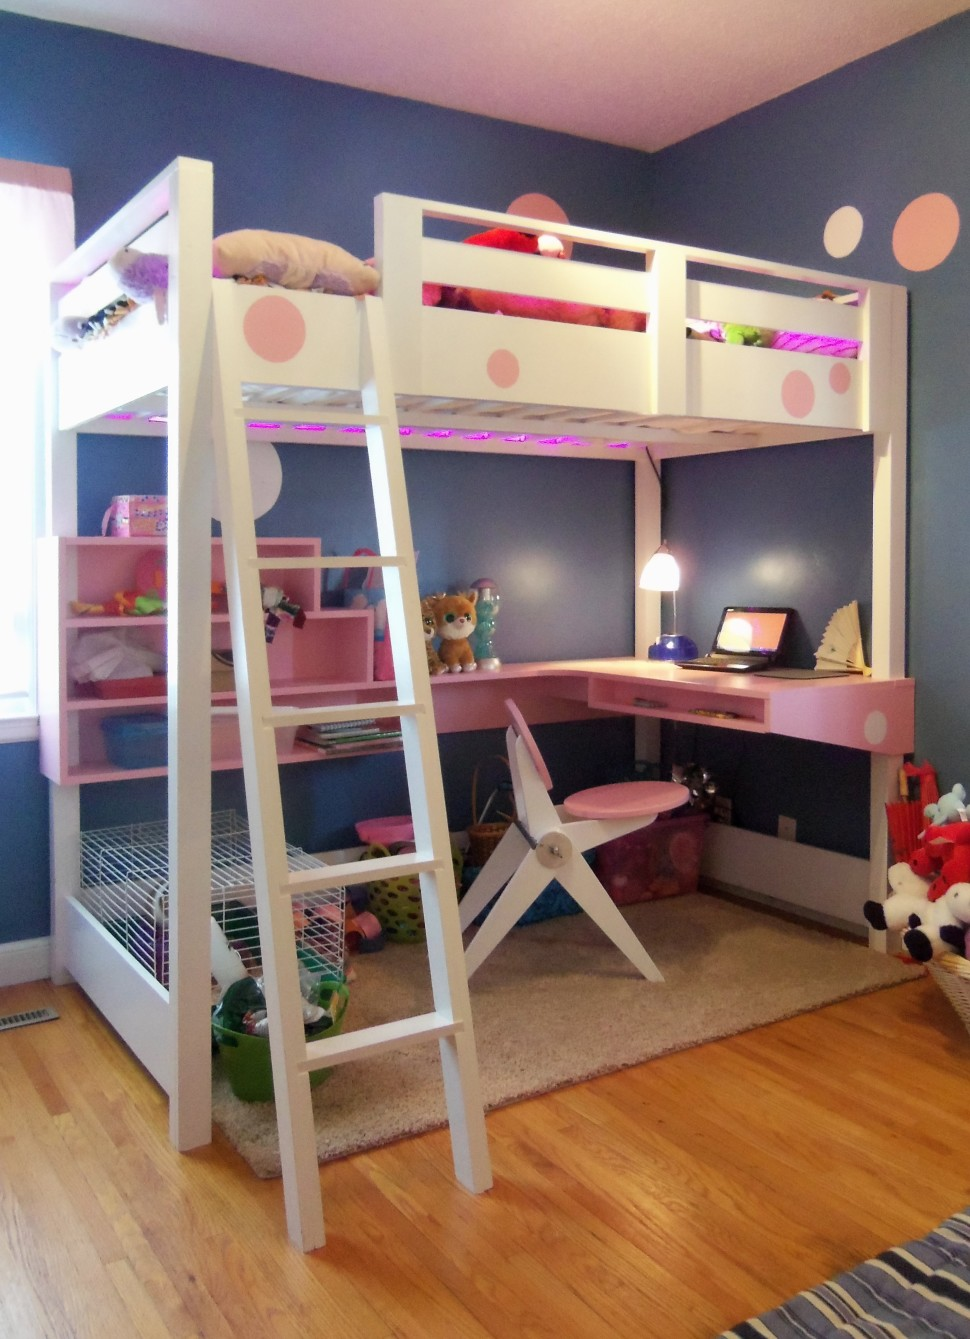 15 Simple Cheap Bedroom Design Ideas - Decoration Love on Bedroom Ideas Cheap  id=91642